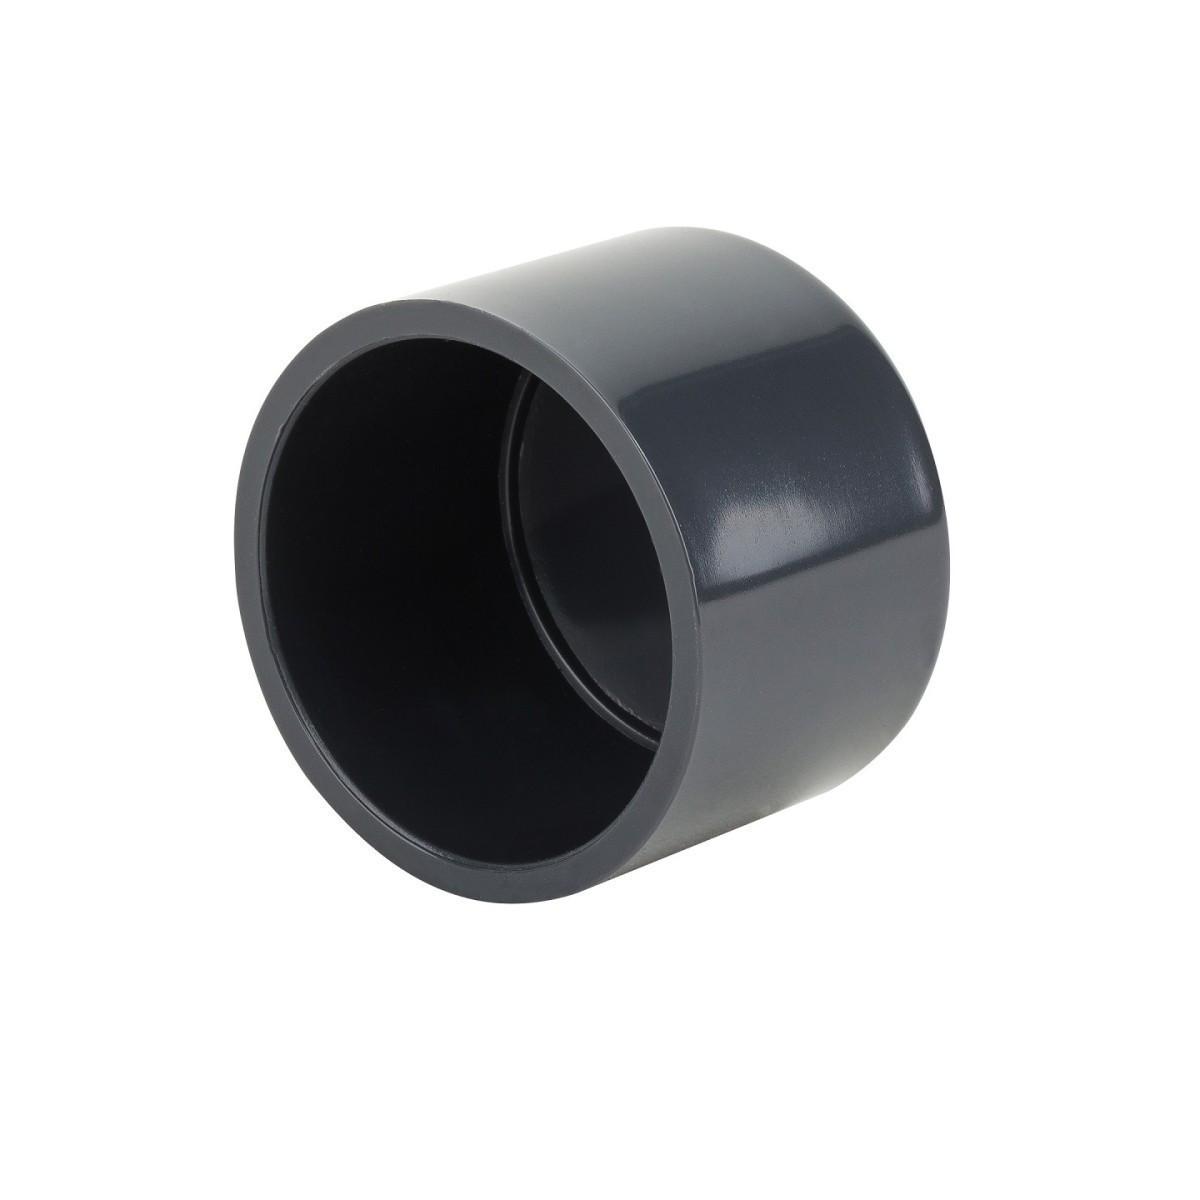 Заглушка ПВХ Aquaviva клеевая, диаметр 90 мм.